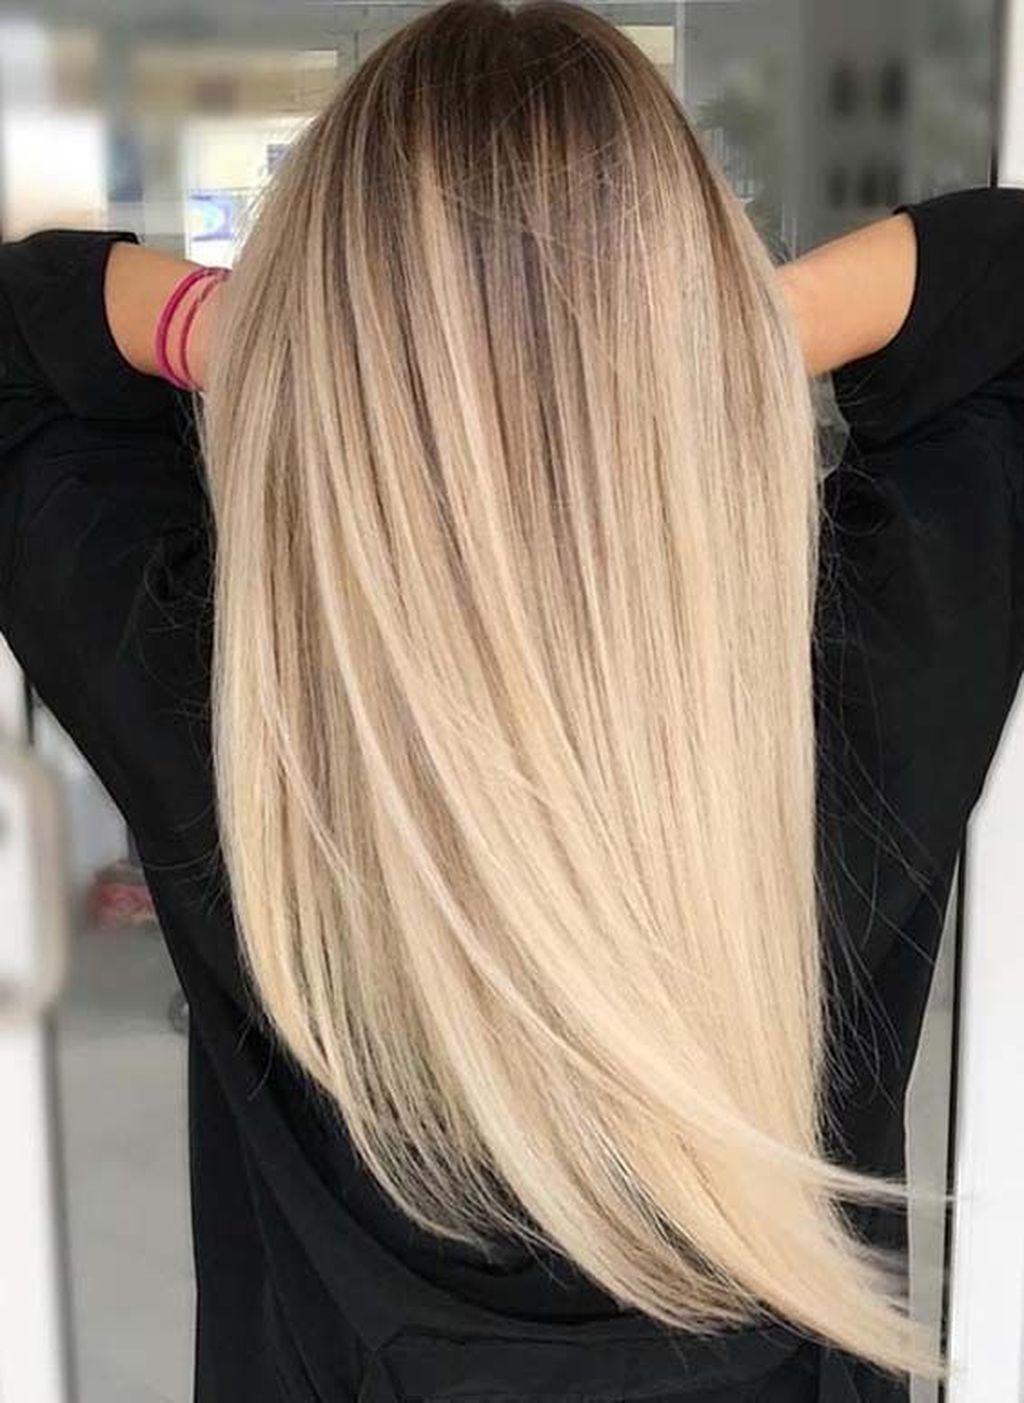 36 Top And Trending Spring Hair Color Ideas 2018 Hair Ideas